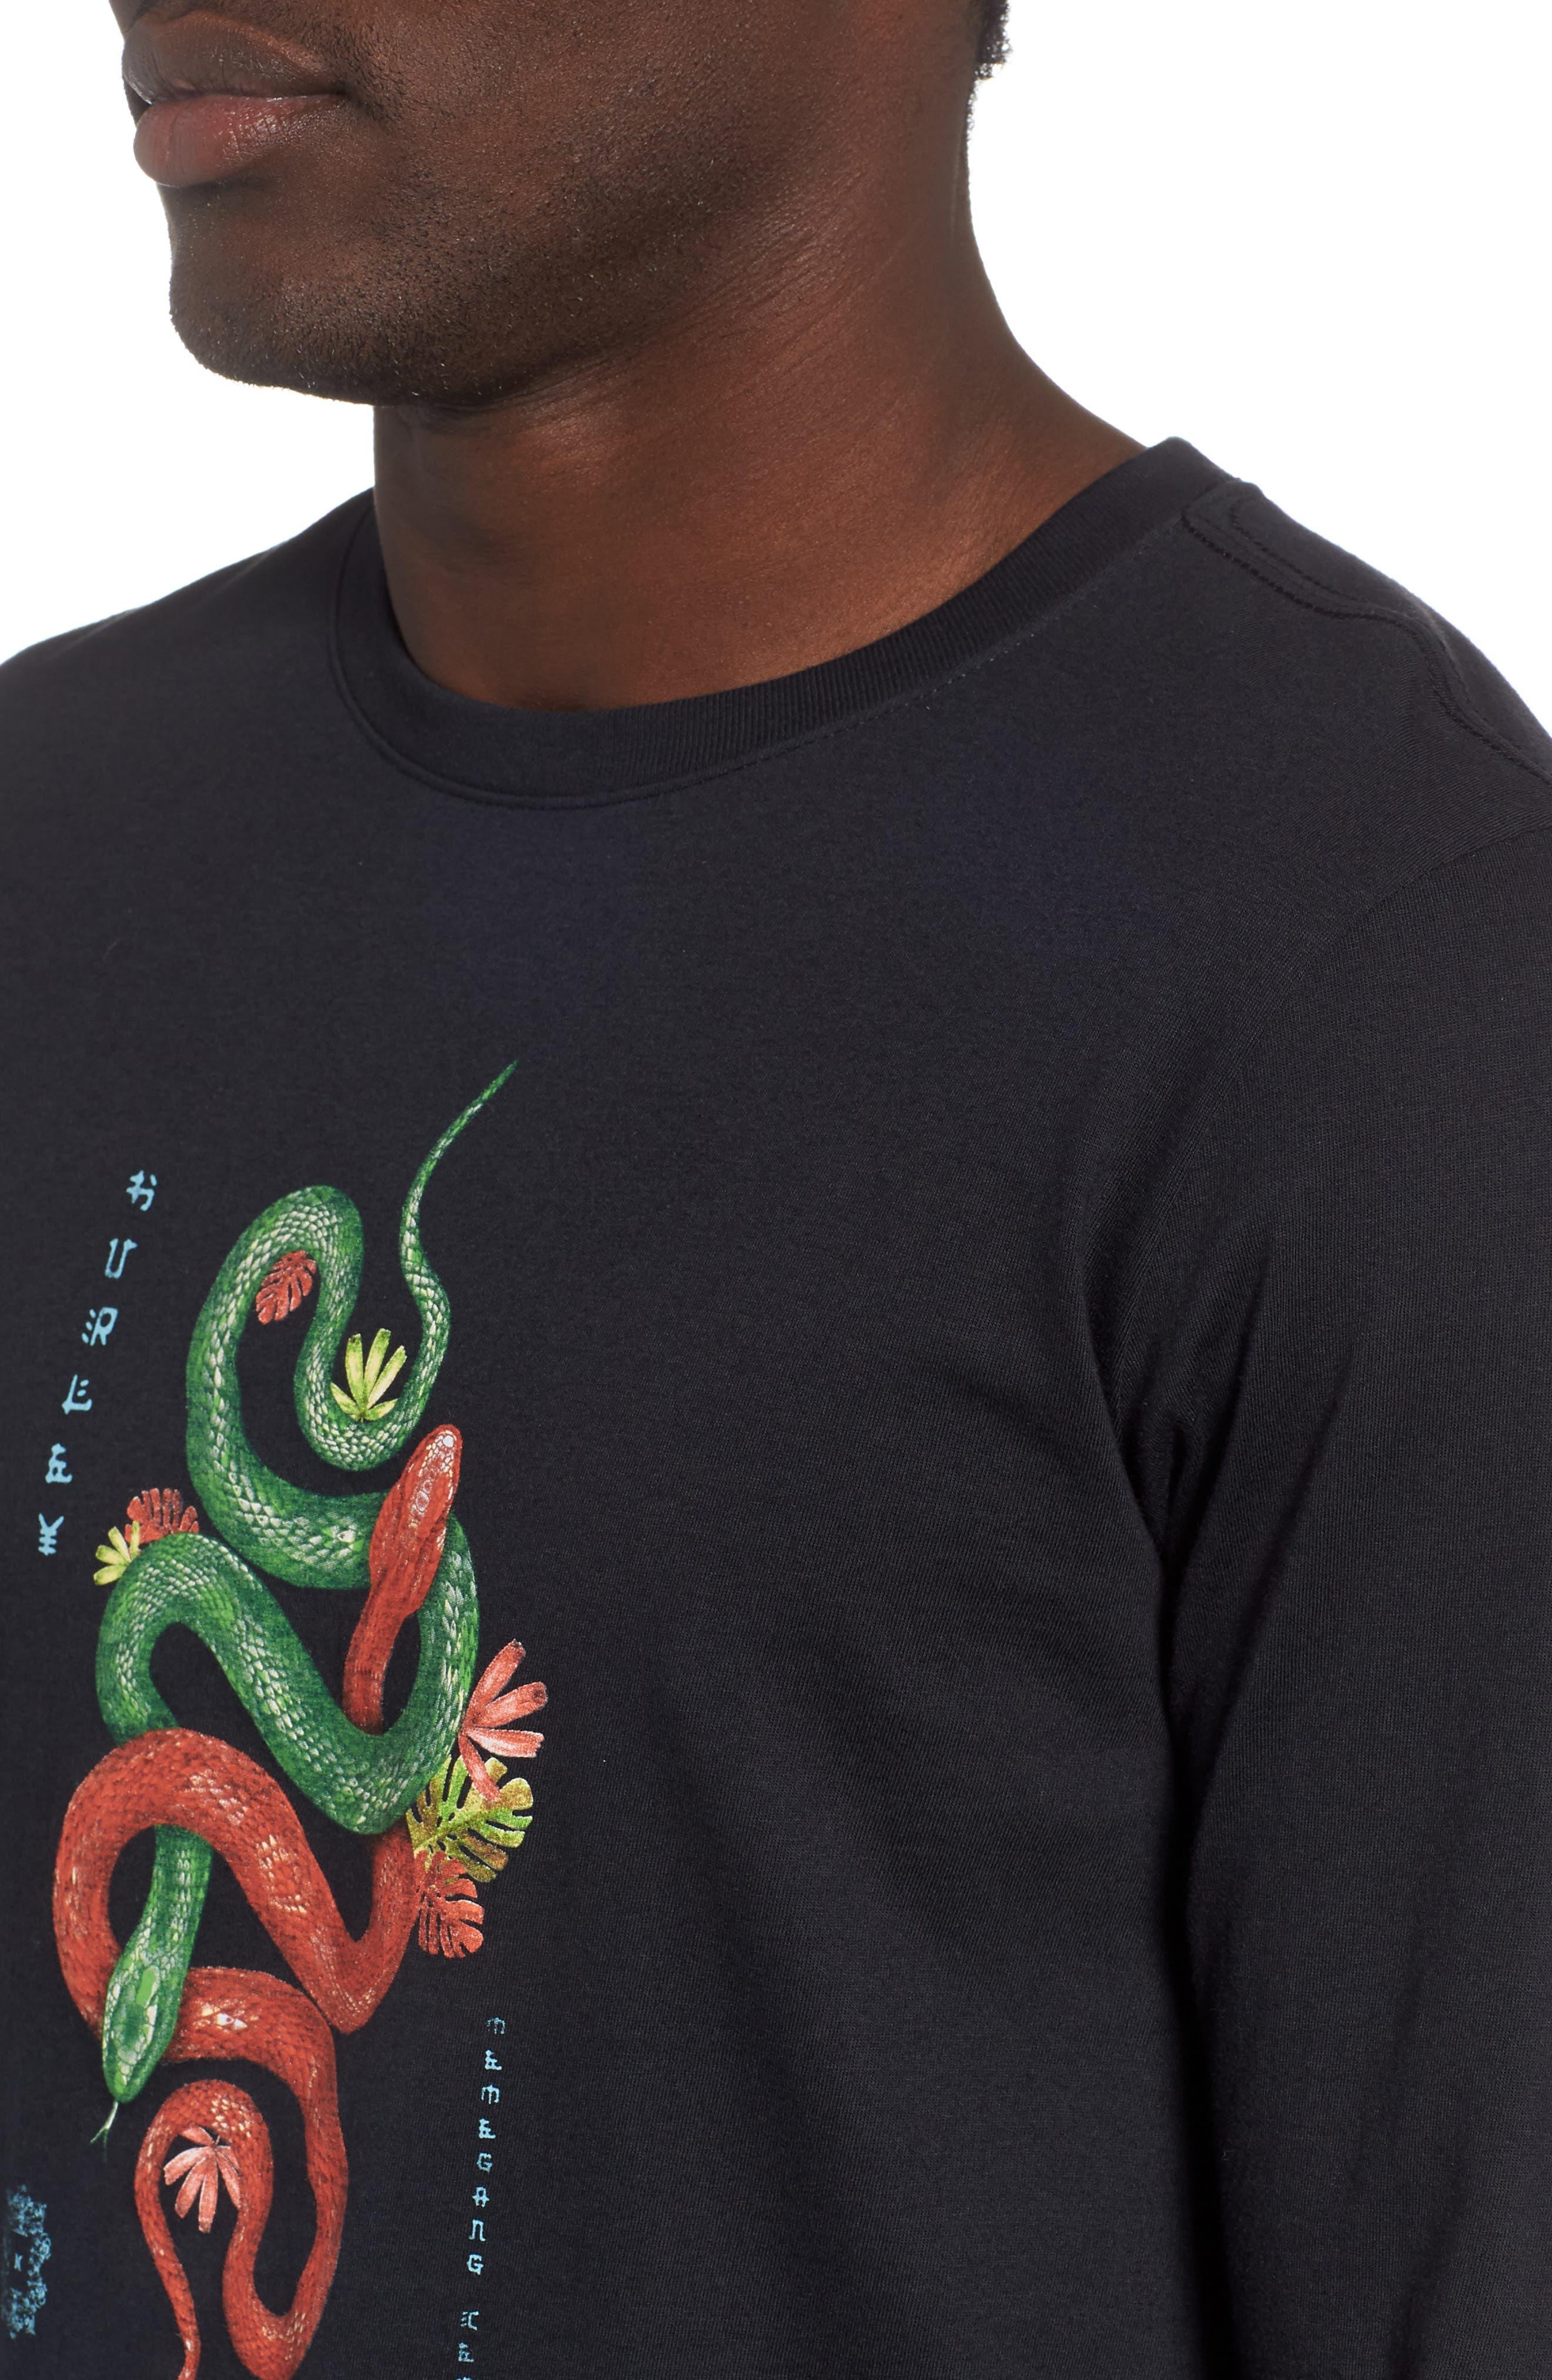 Tread Lightly Long Sleeve T-Shirt,                             Alternate thumbnail 4, color,                             BLACK